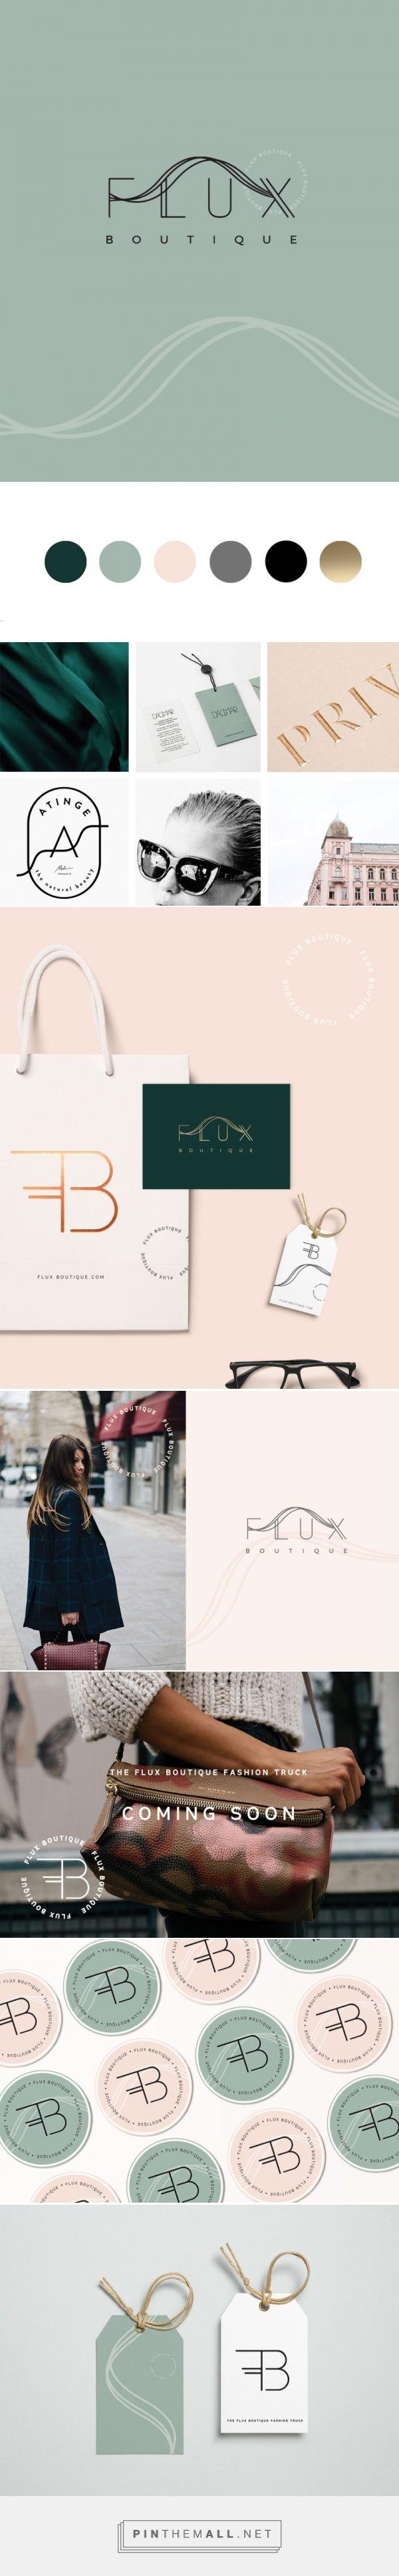 Branding design - Flux Boutique | Ink & Honey Design Co. - created via https://pinthemall.net